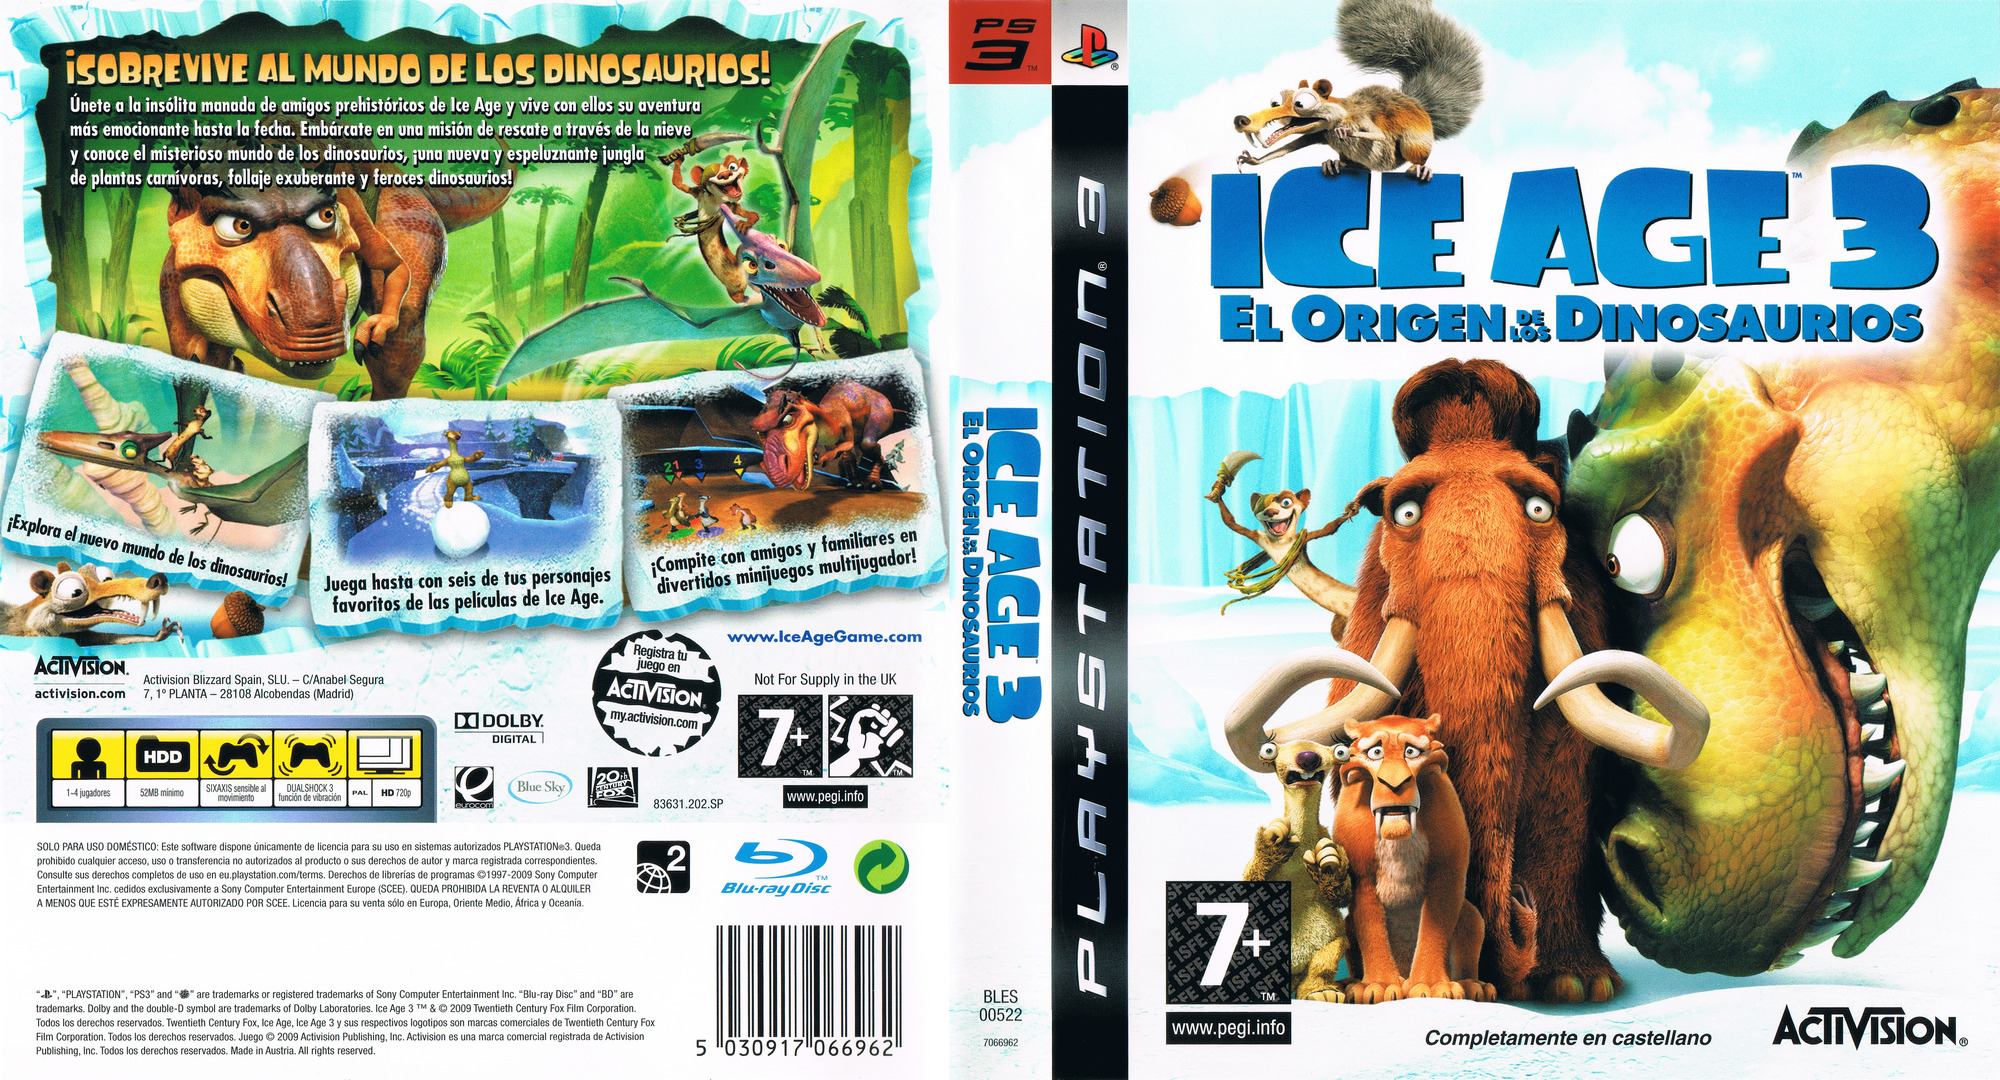 Ice Age 3: El Origen De Los Dinosaurios PS3 coverfullHQ (BLES00522)